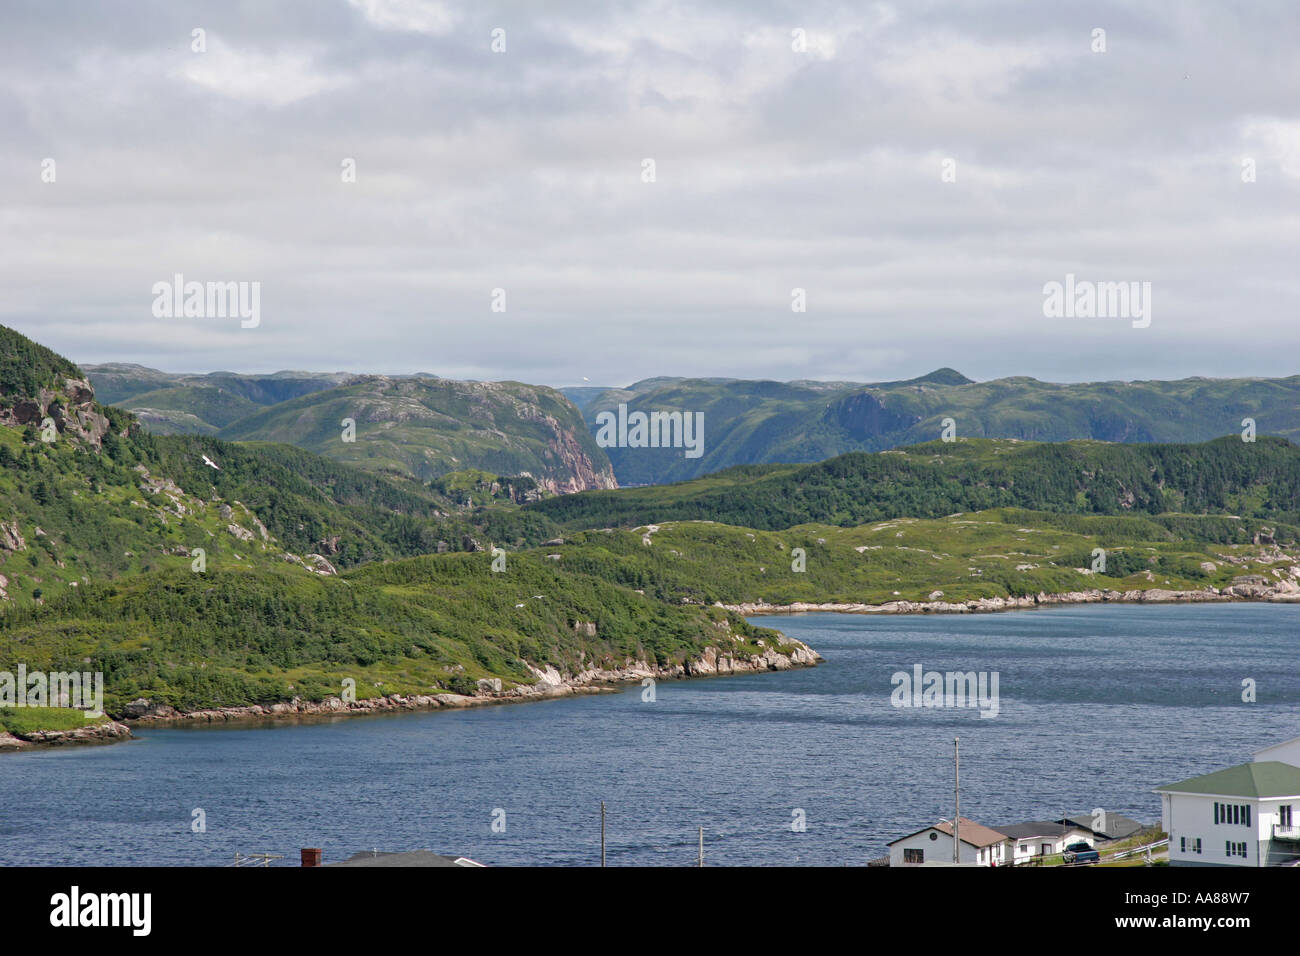 The Short Reach on Newfoundland's Mountainous SW Coast - Stock Image